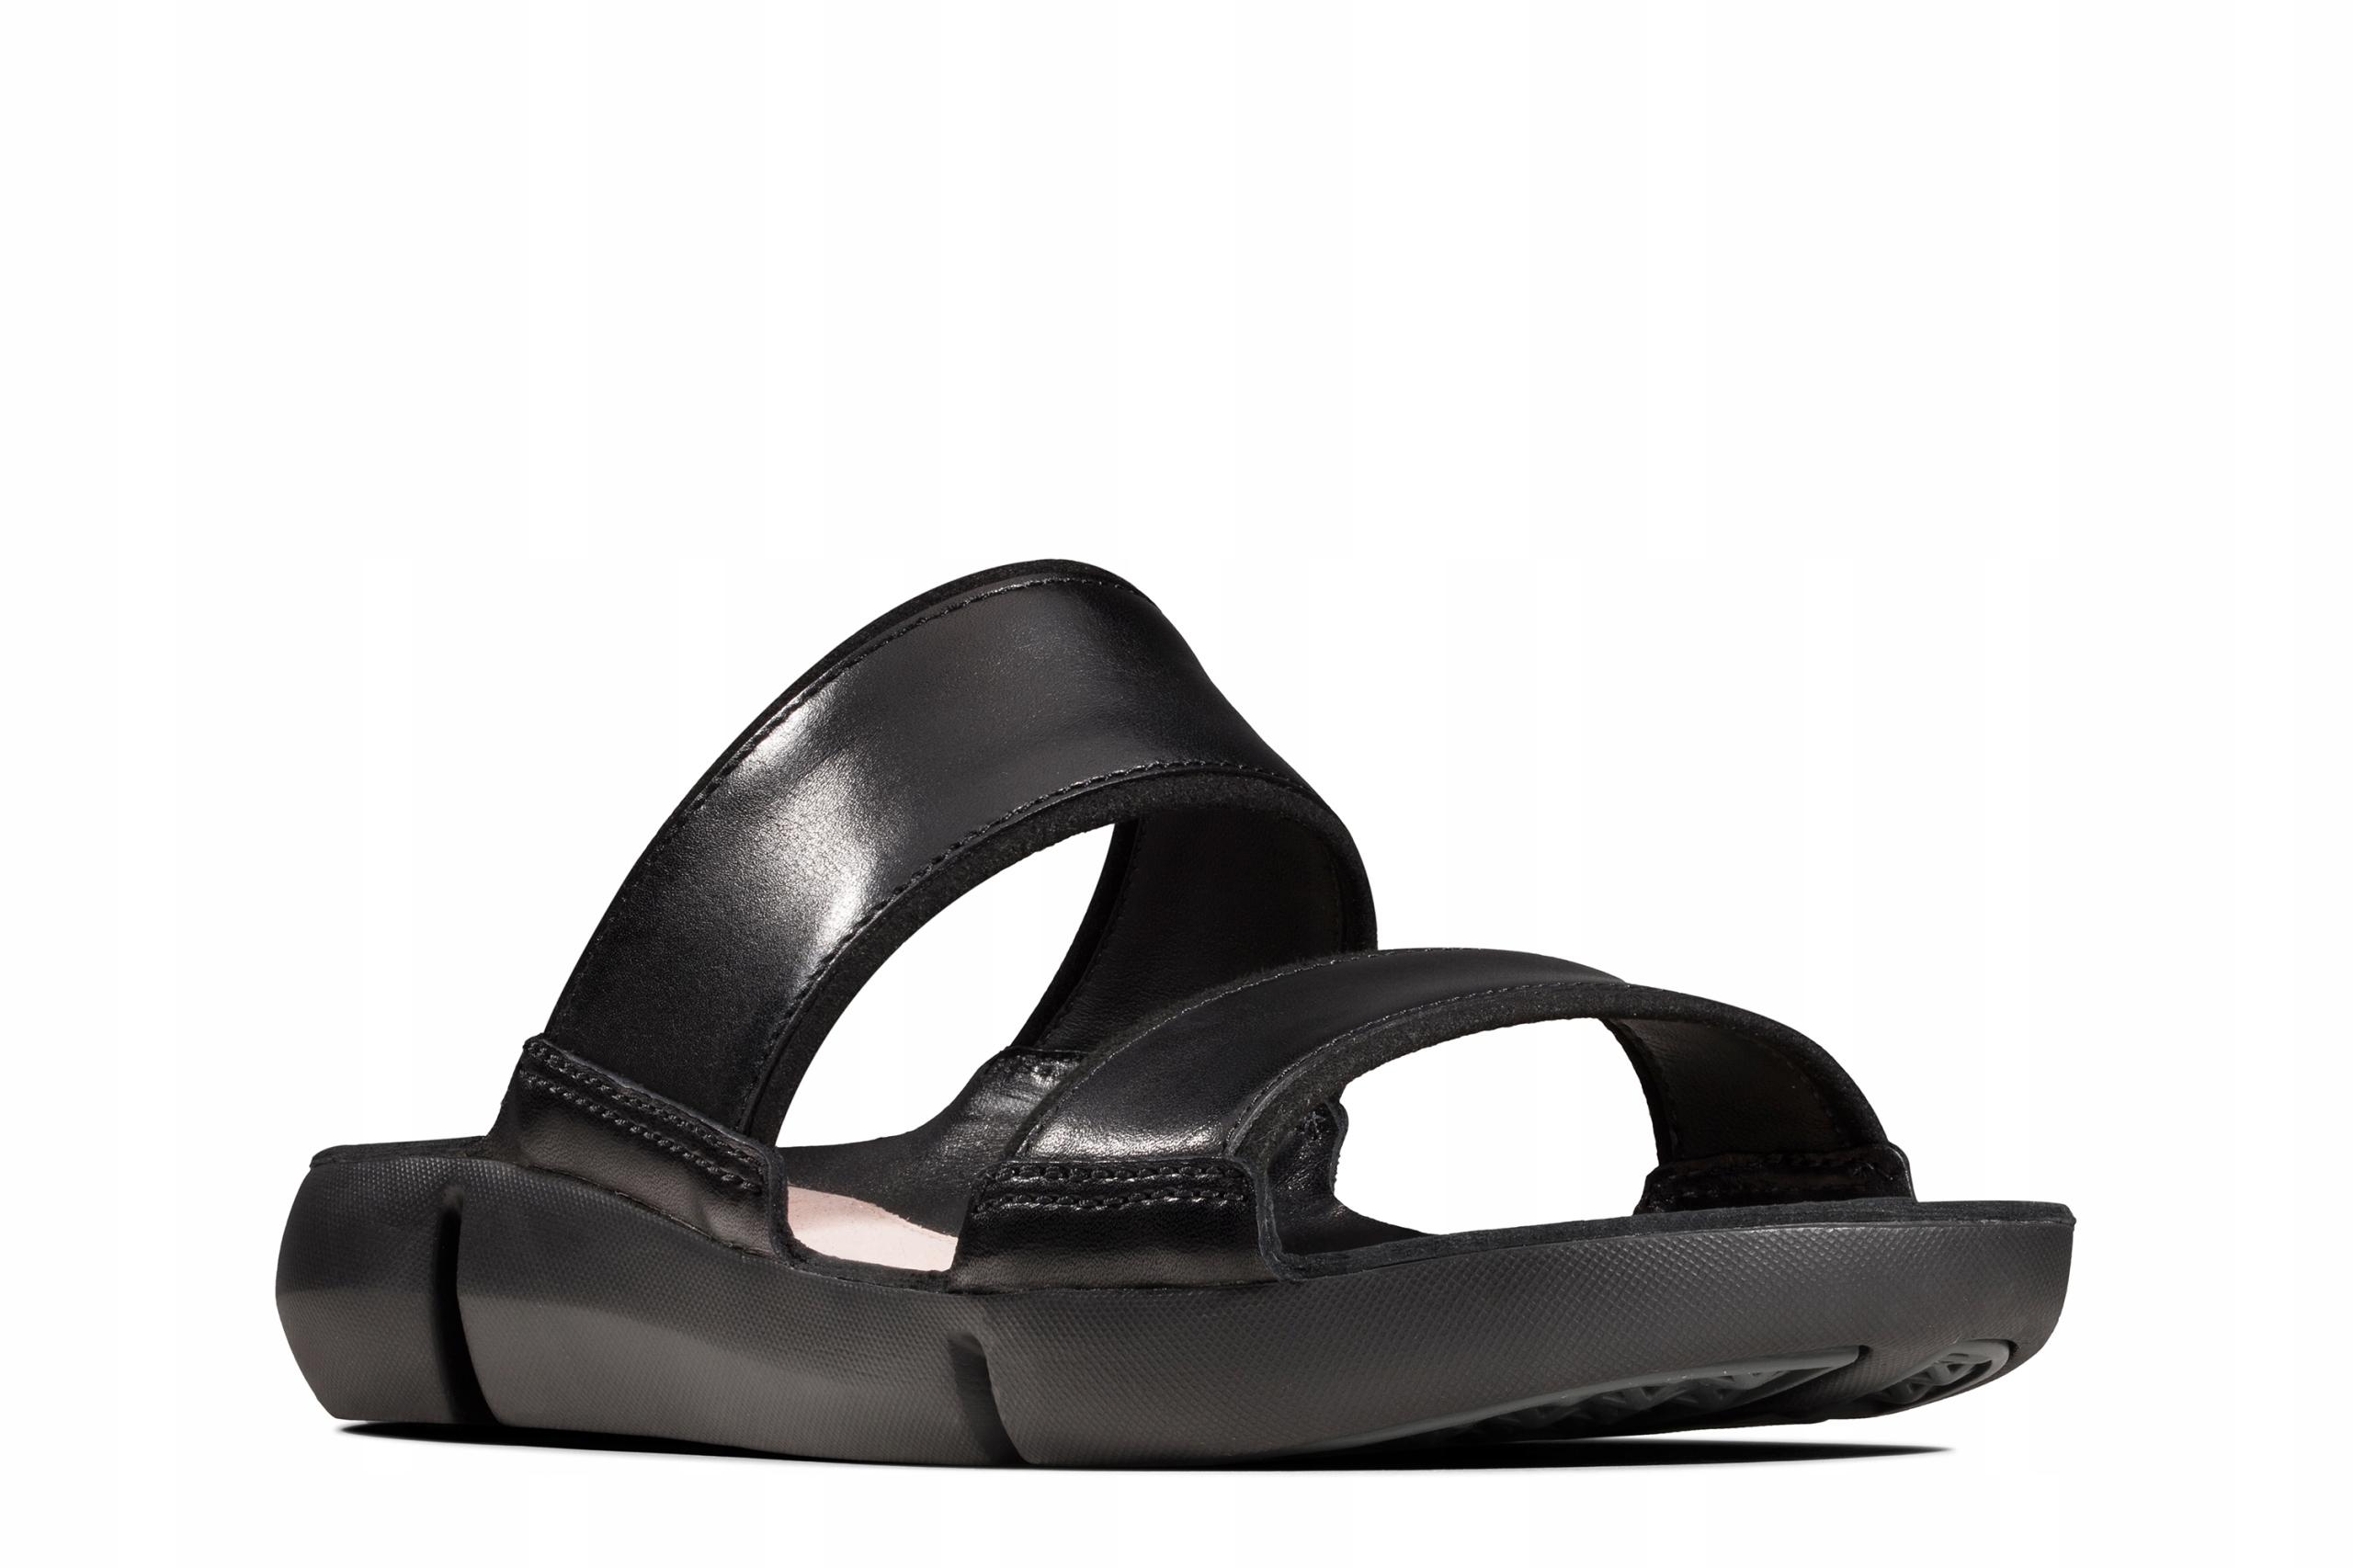 KLAPKI CLARKS TRI SARA Black Leather 39,5